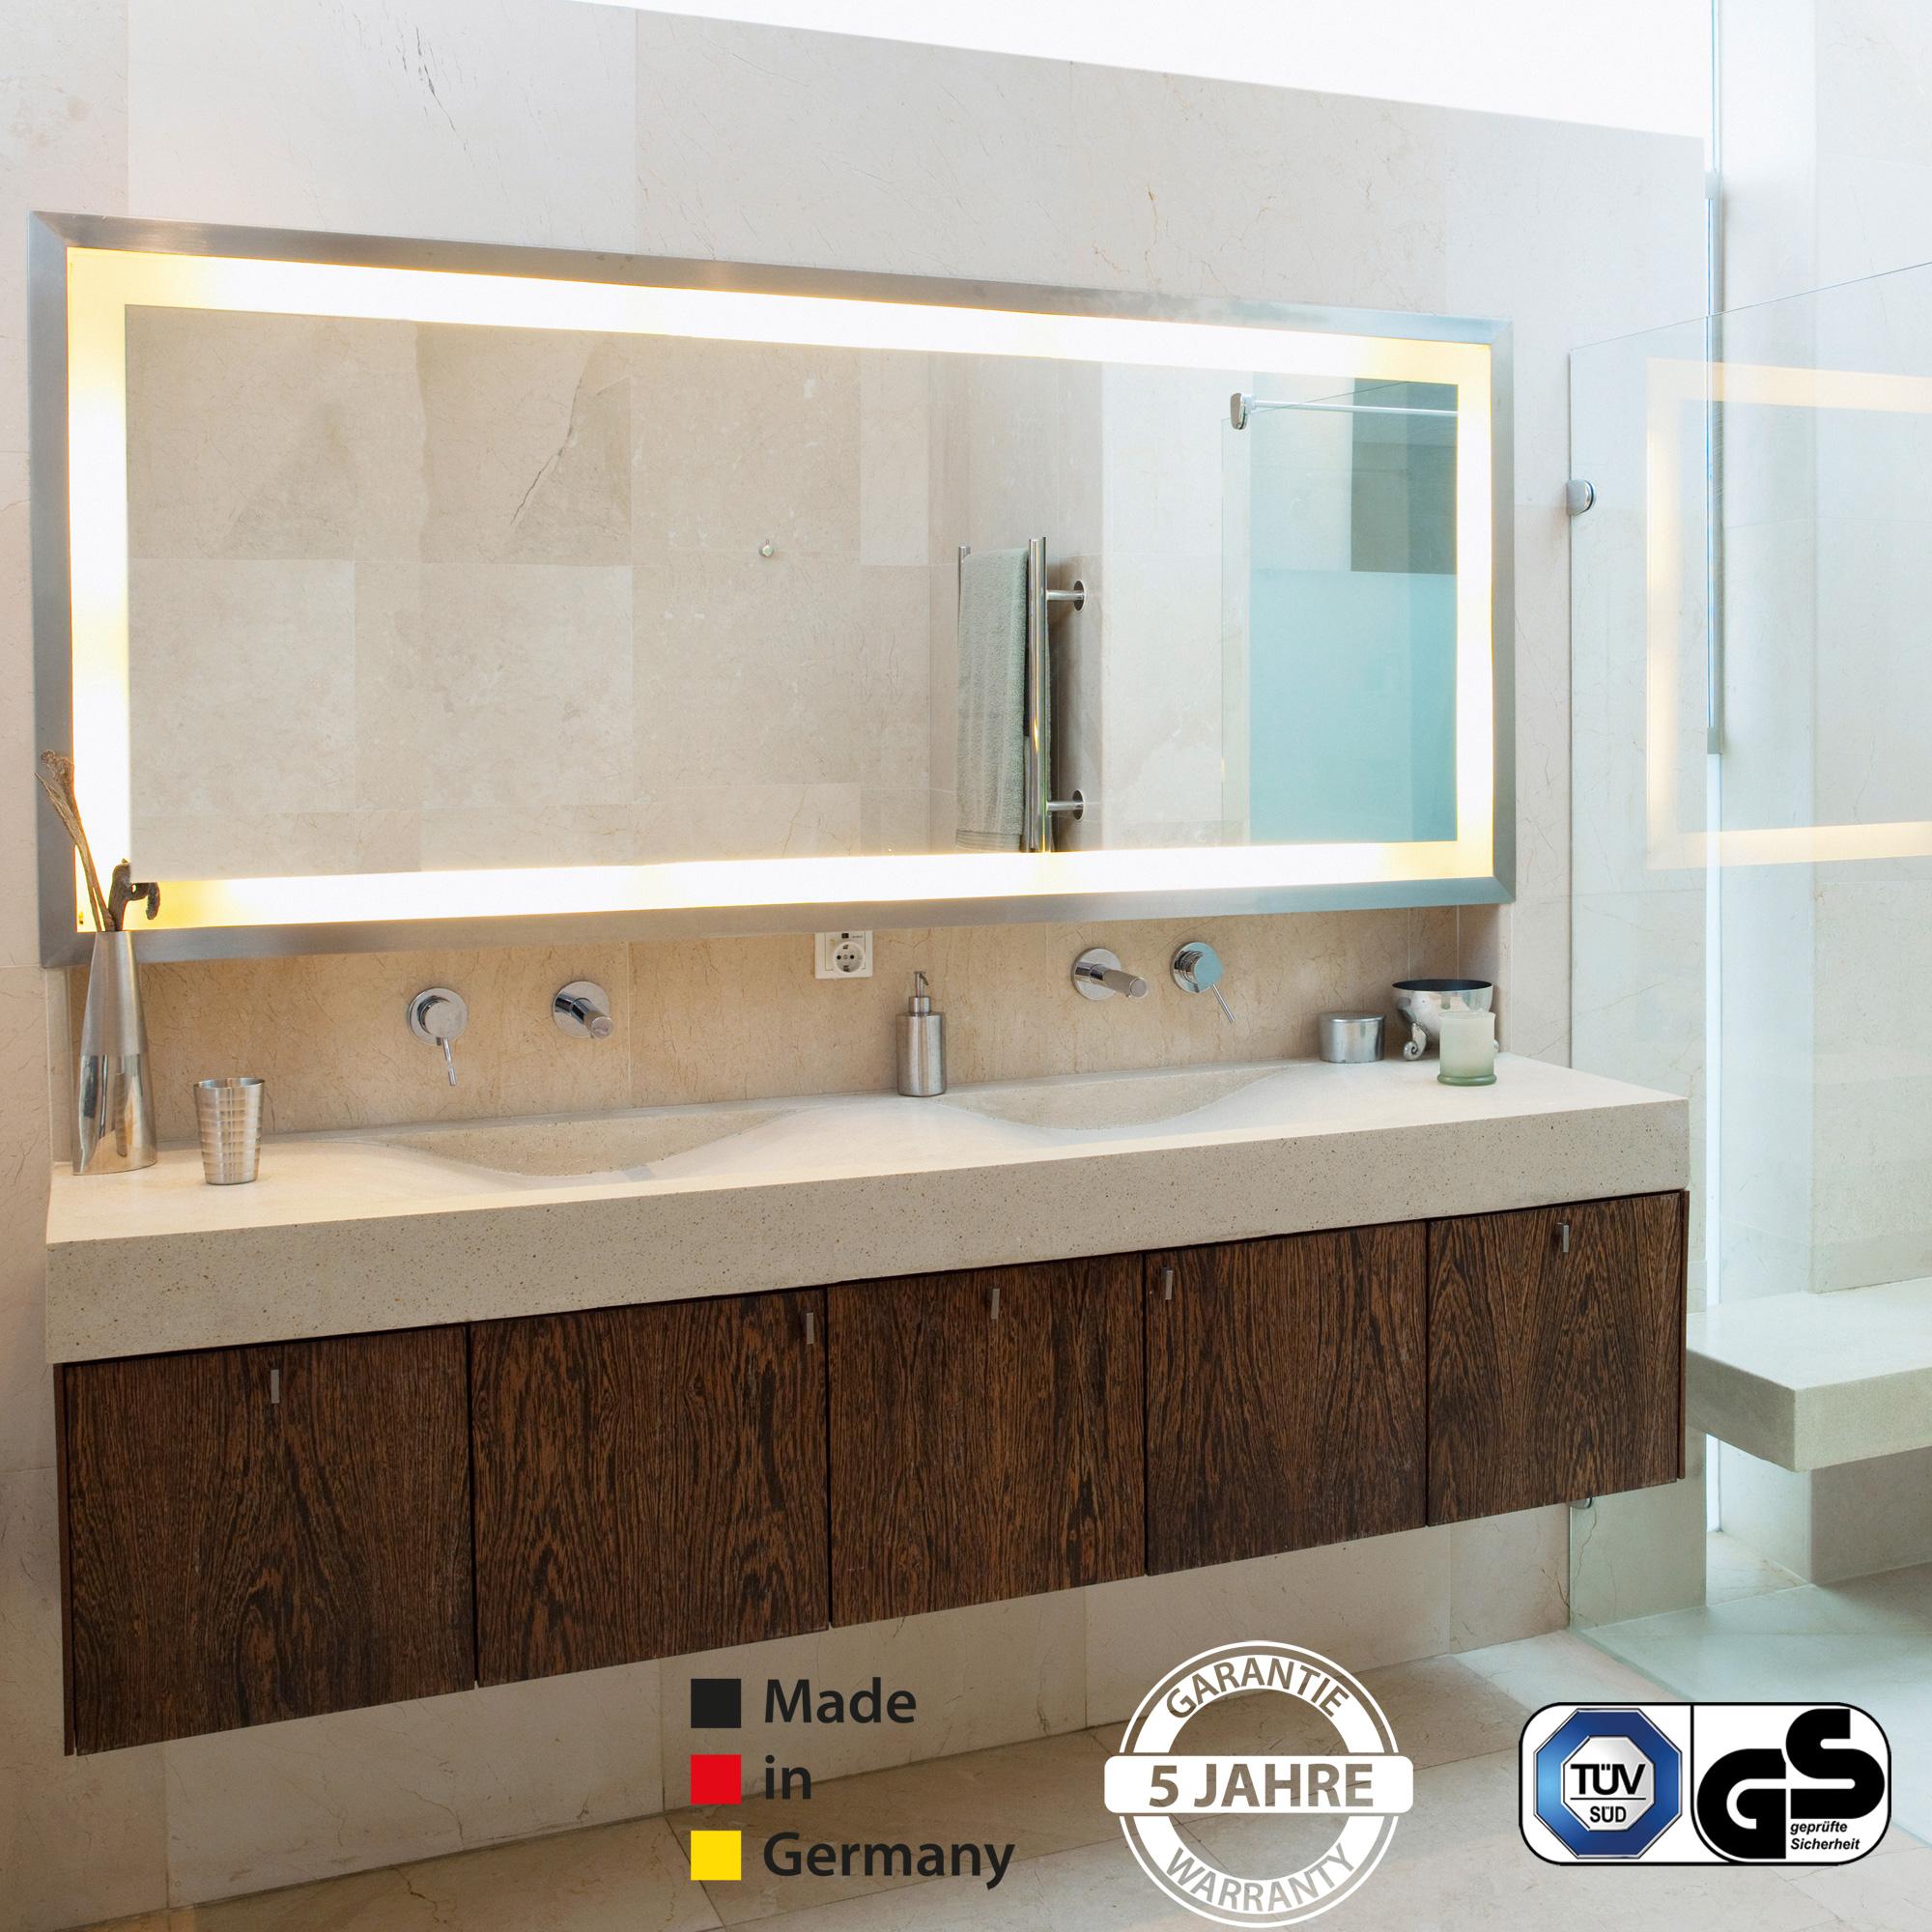 infrarotheizung vasner hohe effizienz t v bis 5 j garantie. Black Bedroom Furniture Sets. Home Design Ideas